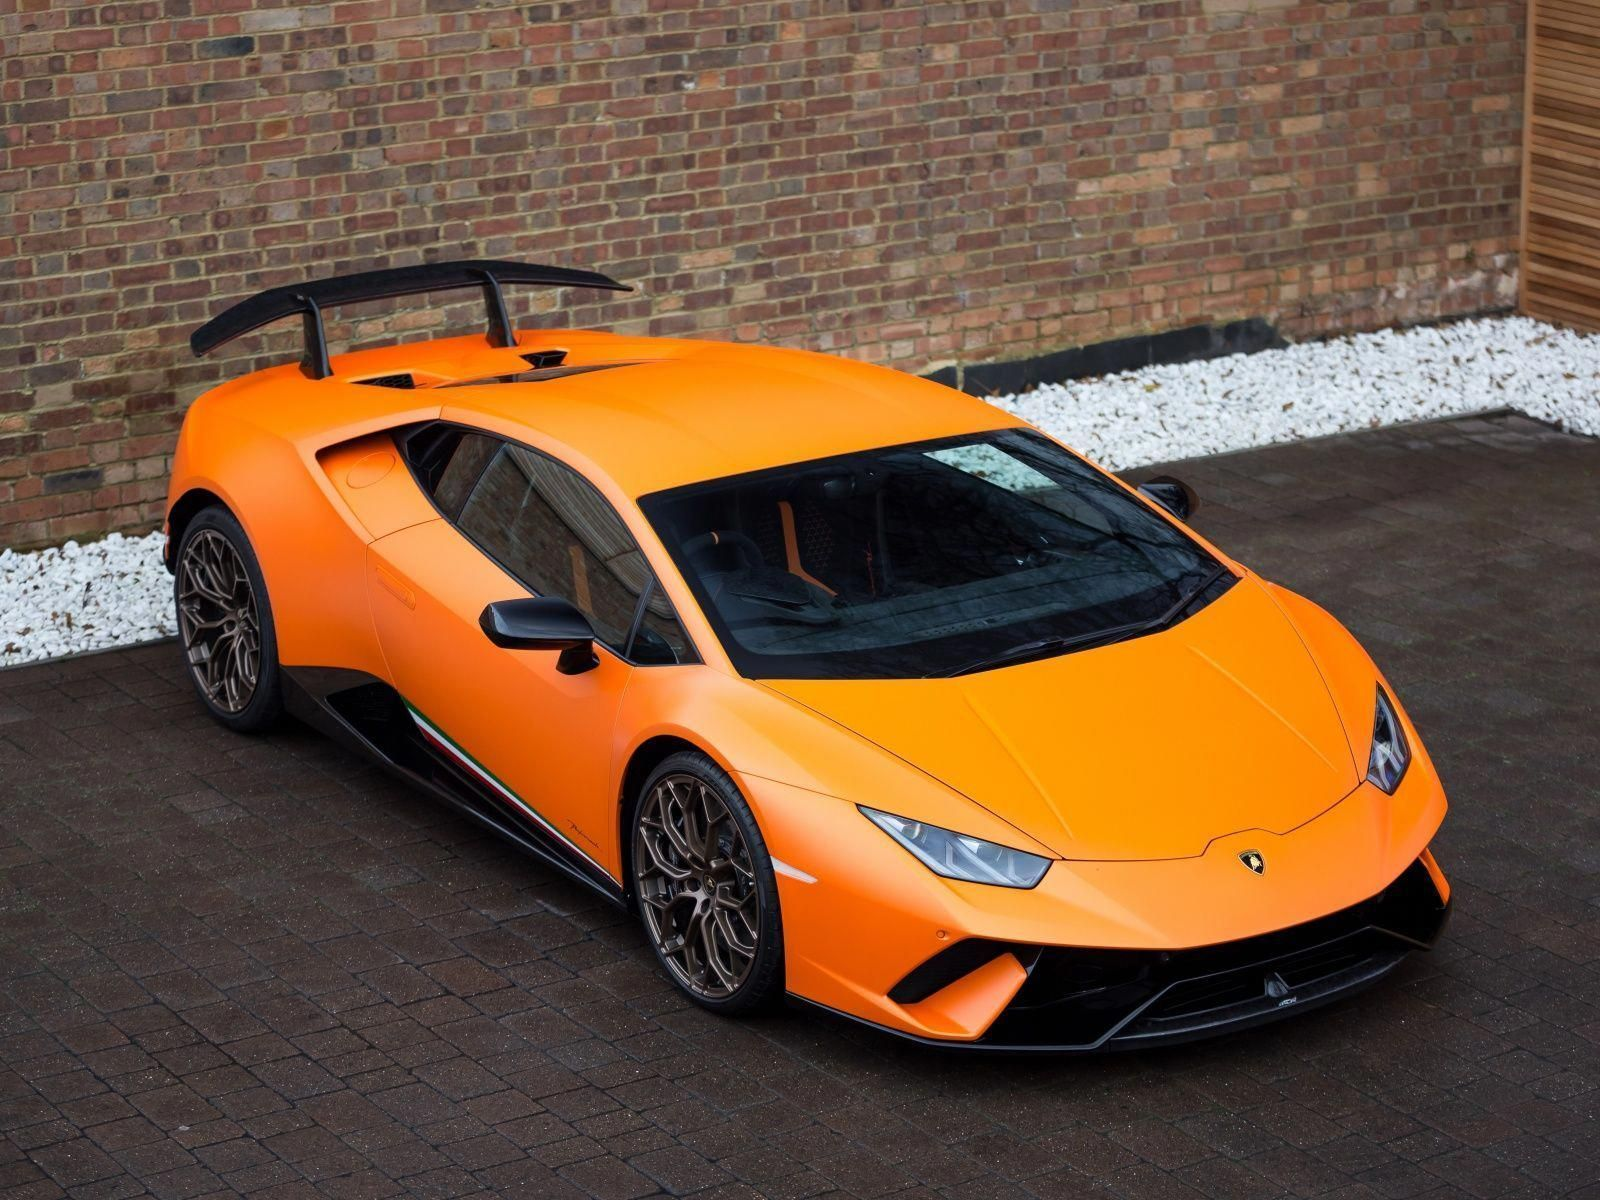 2017 Lamborghini Huracán  - Performante #AlfaRomeo #lamborghinihuracan 2017 Lamborghini Huracán  - Performante #AlfaRomeo #lamborghinihuracan 2017 Lamborghini Huracán  - Performante #AlfaRomeo #lamborghinihuracan 2017 Lamborghini Huracán  - Performante #AlfaRomeo #lamborghinihuracan 2017 Lamborghini Huracán  - Performante #AlfaRomeo #lamborghinihuracan 2017 Lamborghini Huracán  - Performante #AlfaRomeo #lamborghinihuracan 2017 Lamborghini Huracán  - Performante #AlfaRomeo #lamborghinihura #lamborghinihuracan